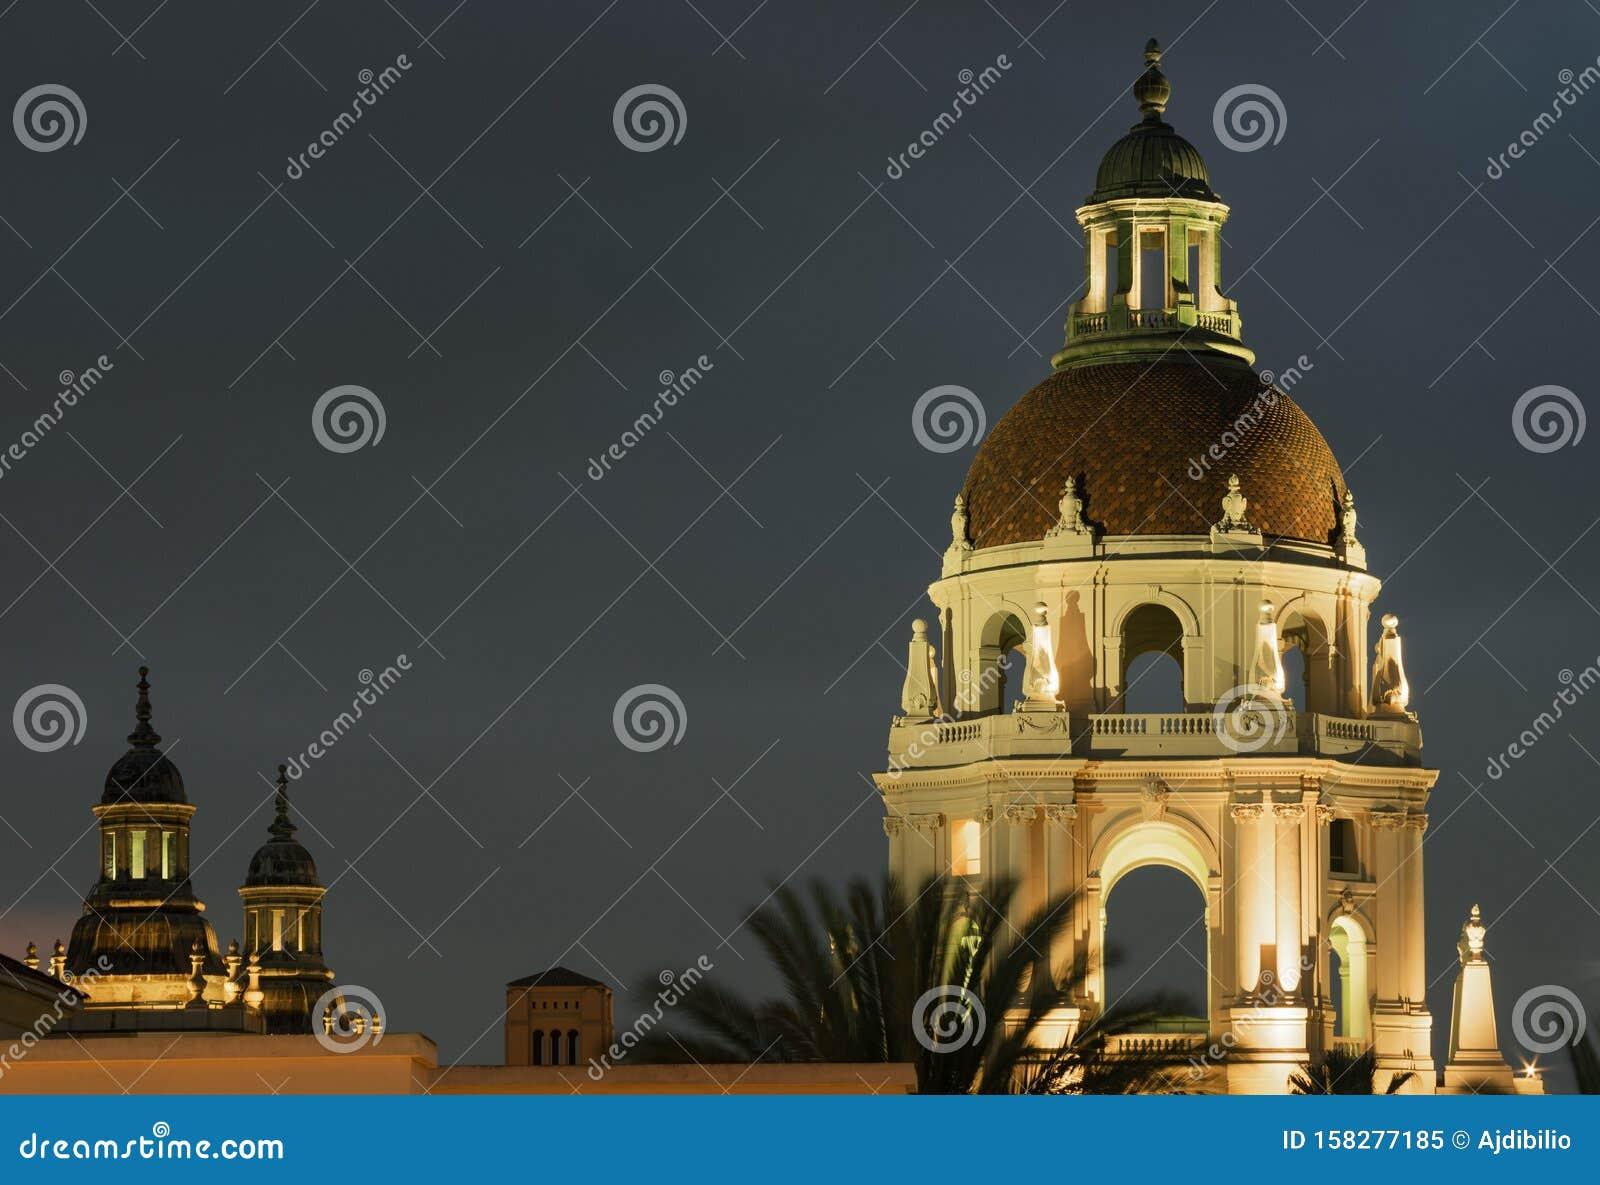 Illuminated Pasadena City Hall Dome and Towers